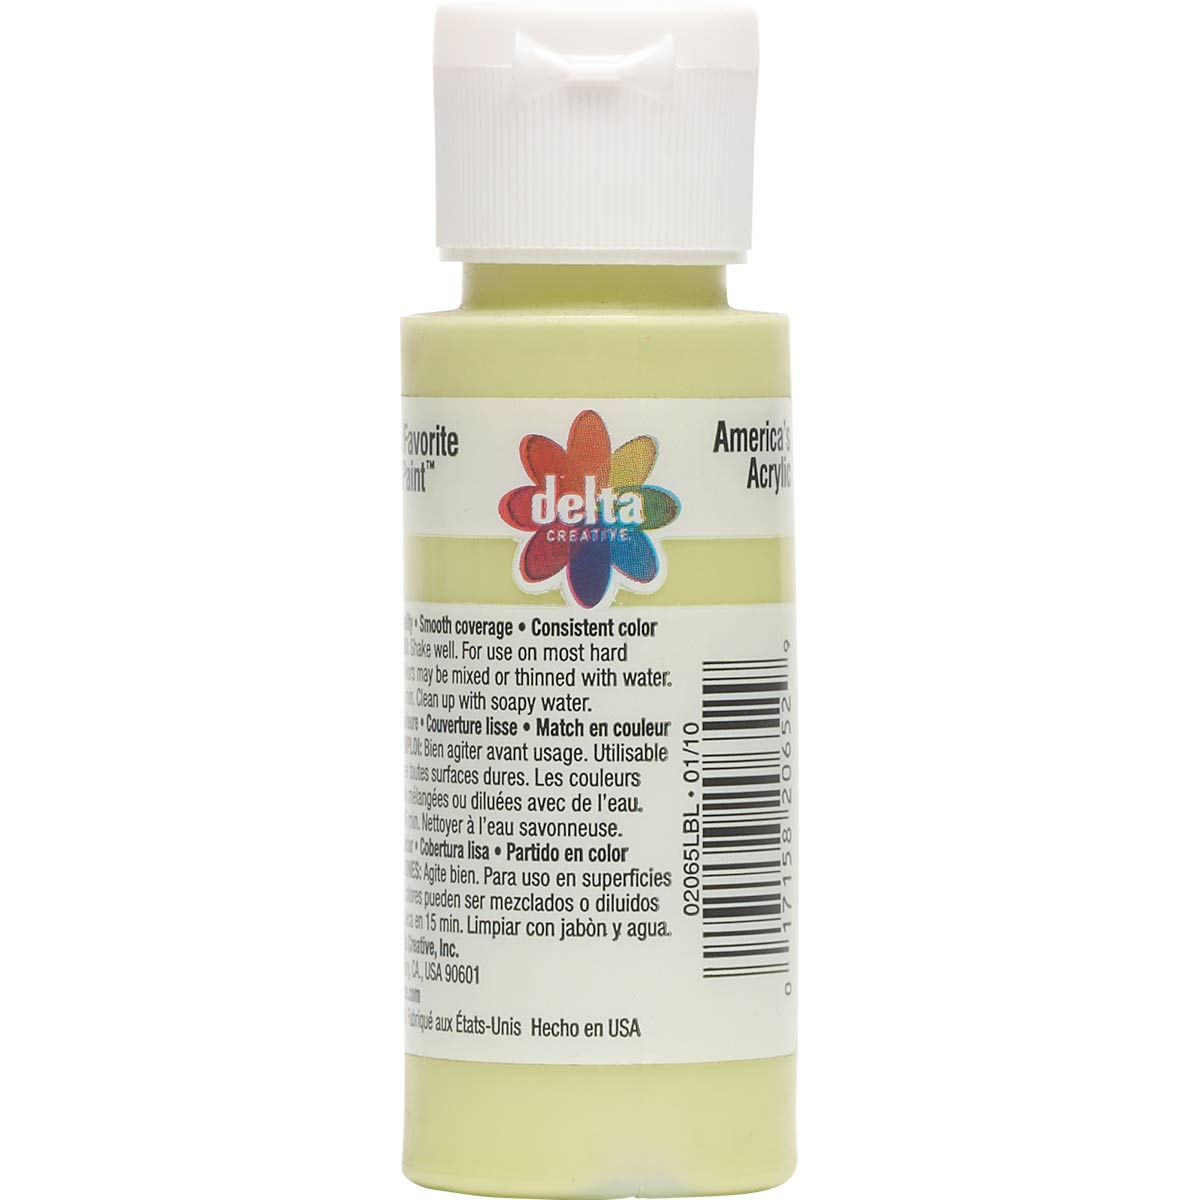 Delta Ceramcoat ® Acrylic Paint - Apple Green, 2 oz.